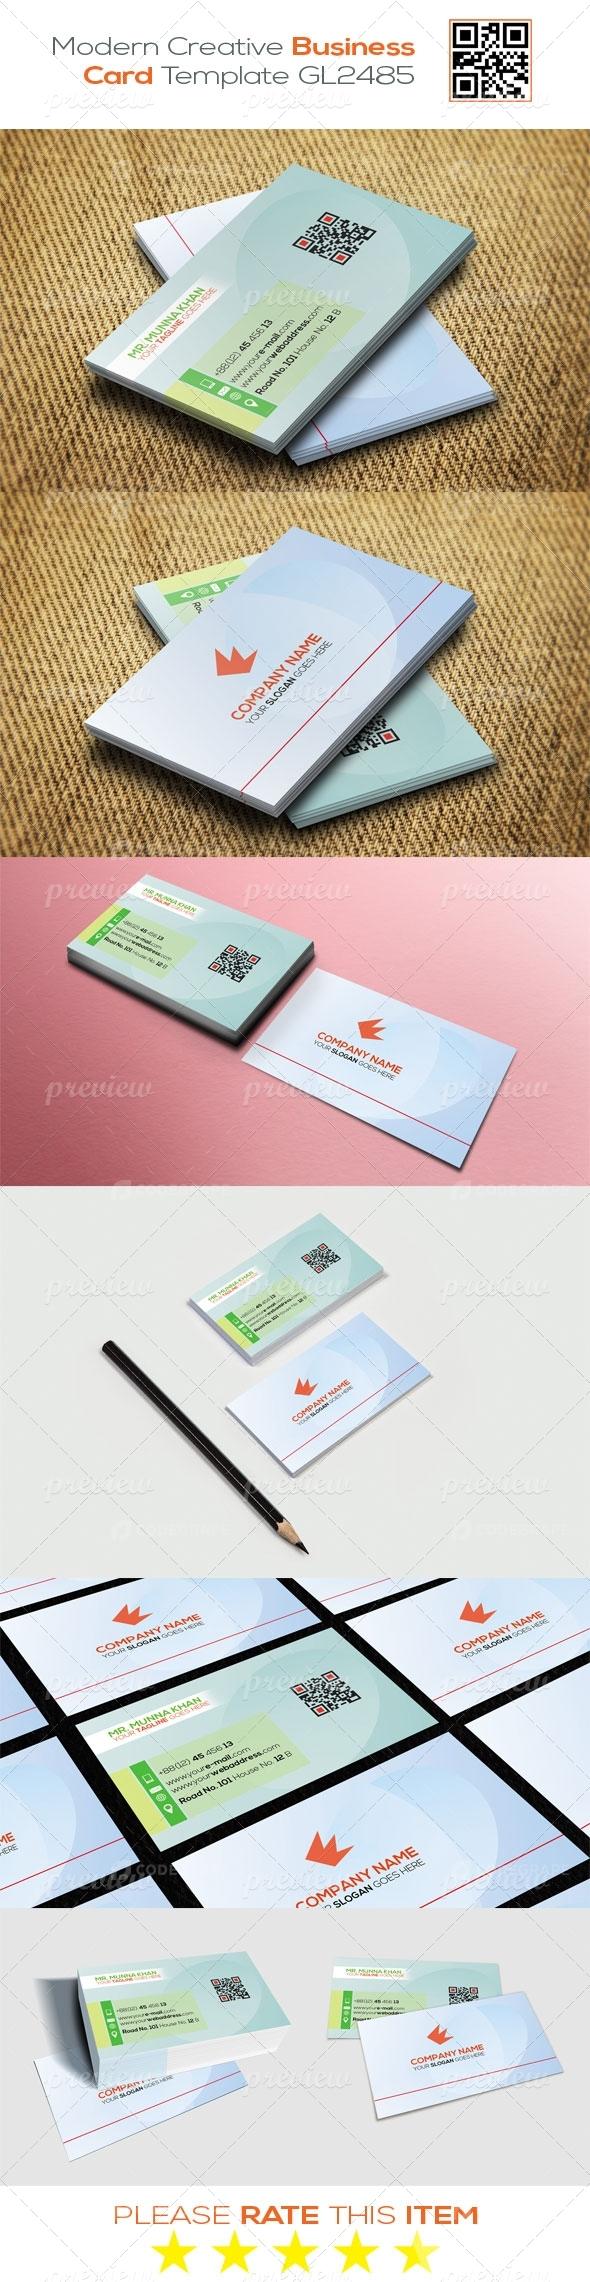 Modern Creative Business Card Template GL2485